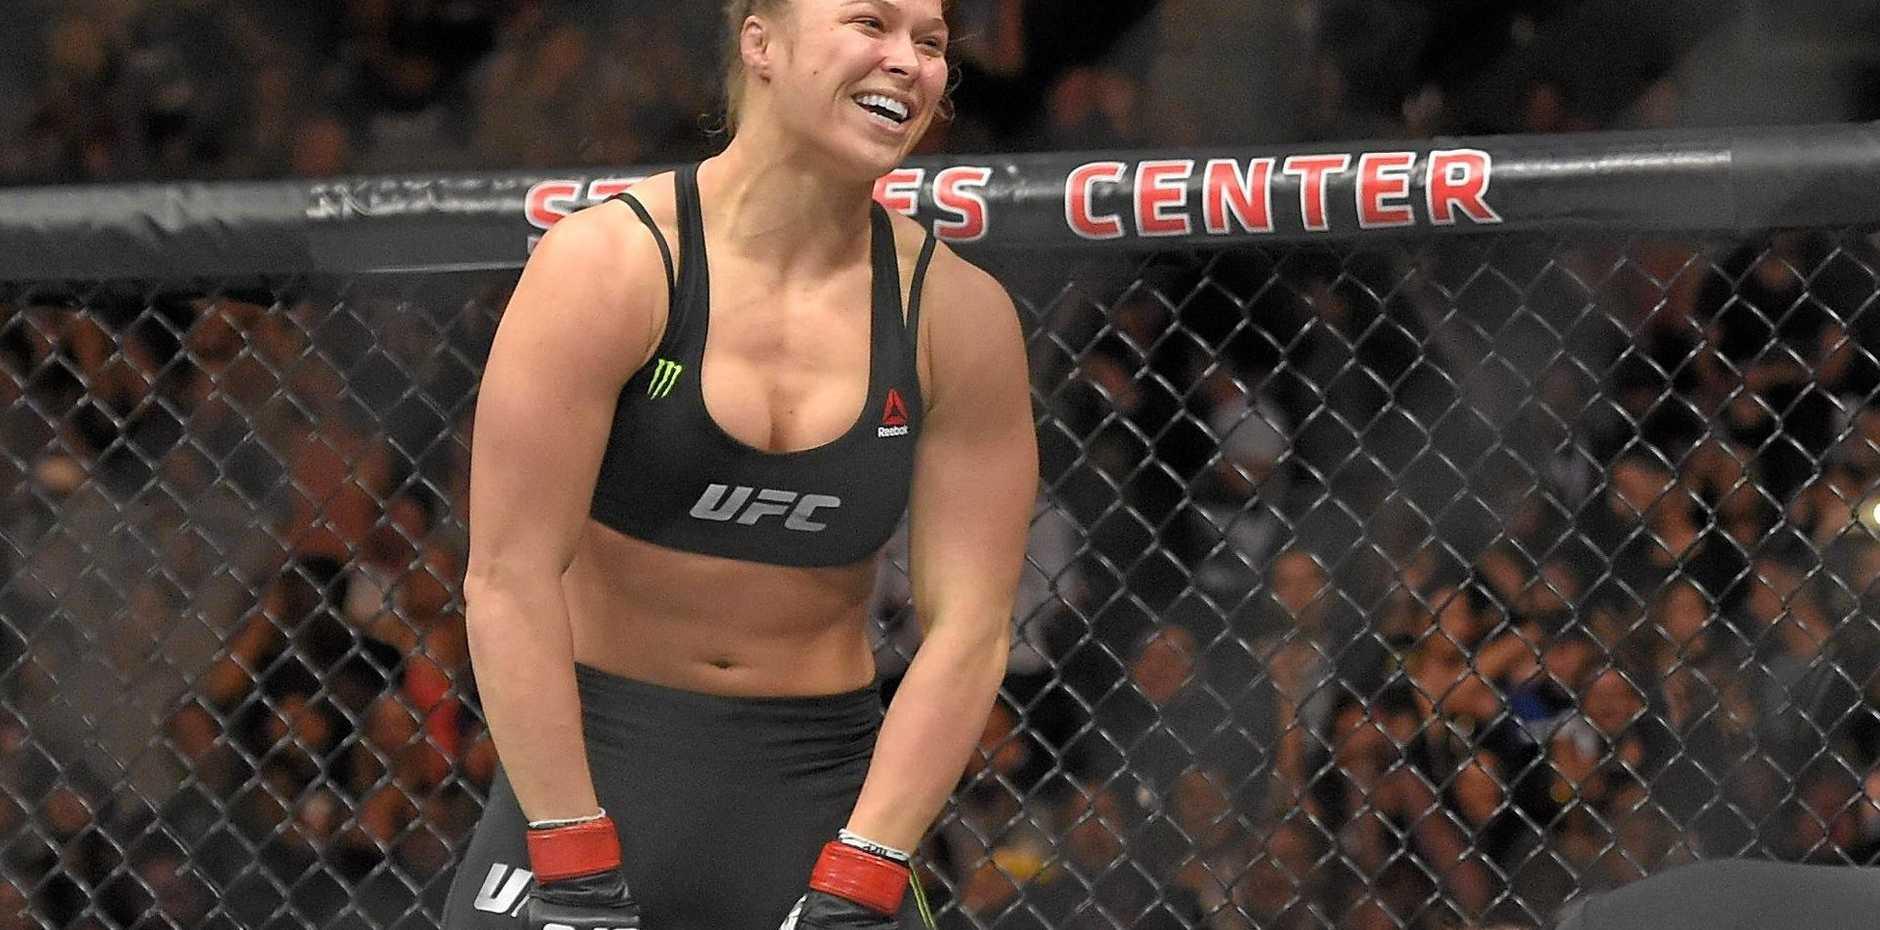 BIG NAME: Ronda Rousey, top, celebrates as Cat Zingano kneels on the mat during a UFC 184 mixed martial arts bantamweight title bout.